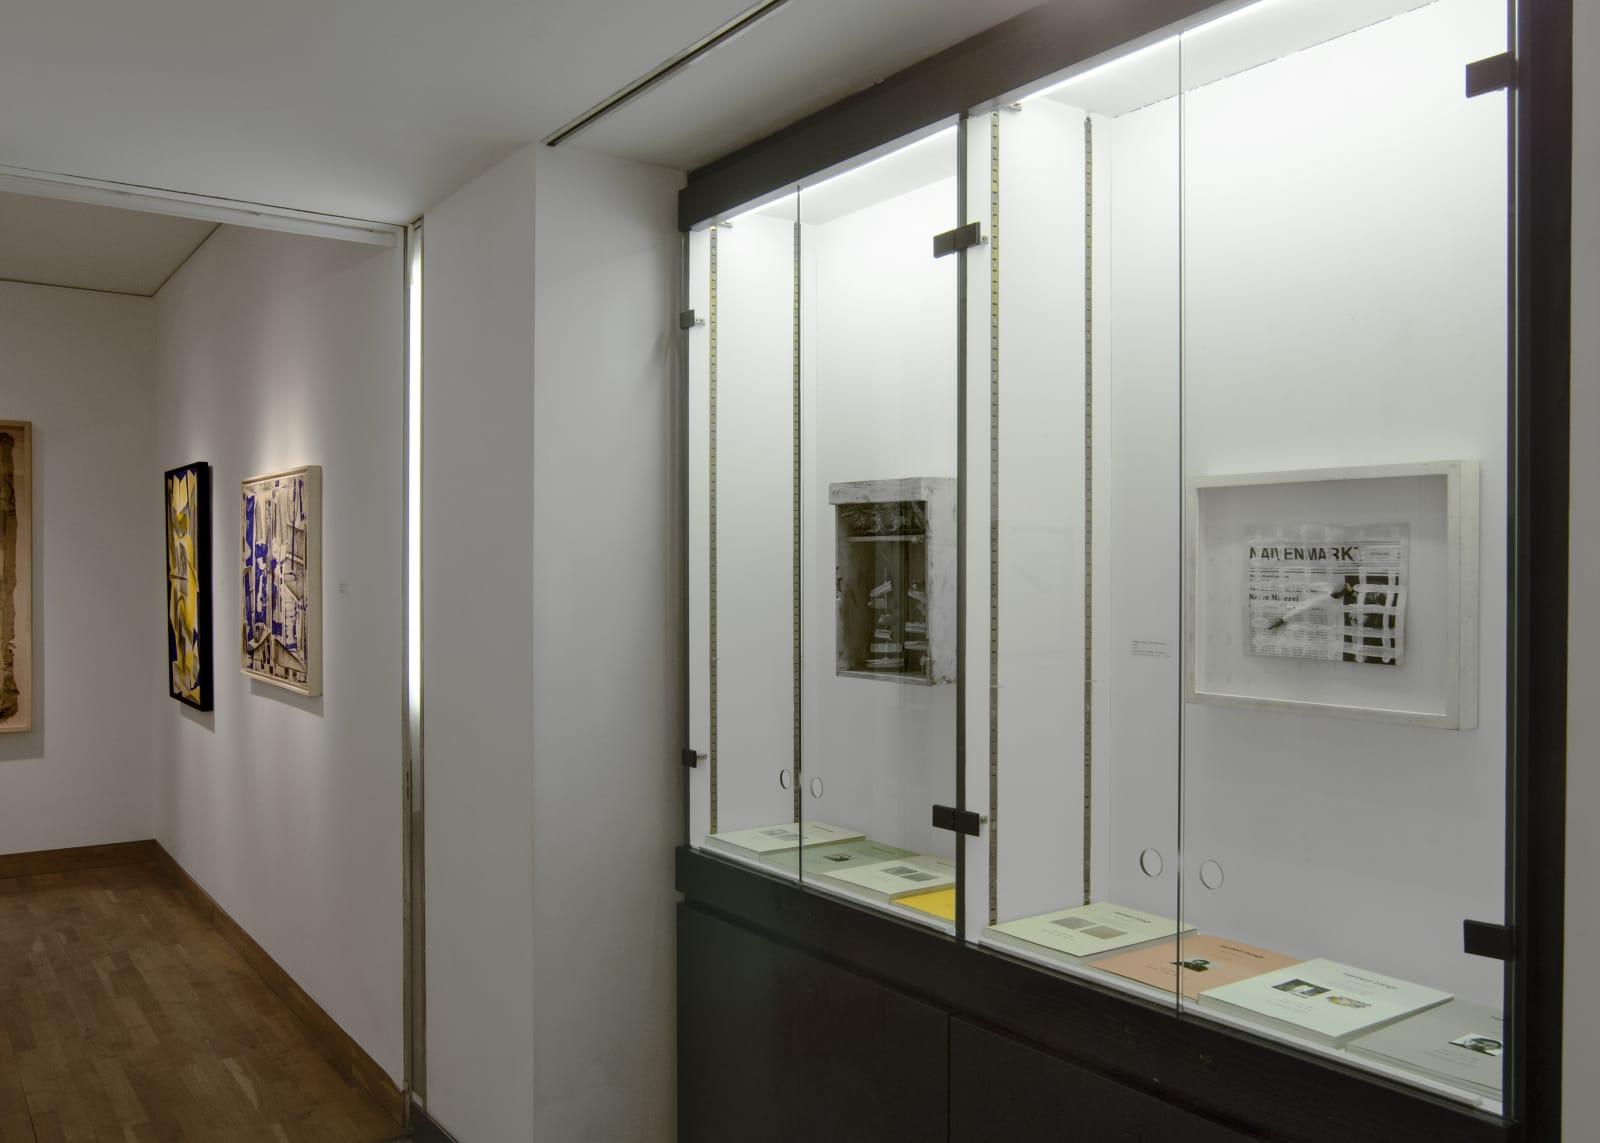 HERBERT ZANGS Installation view